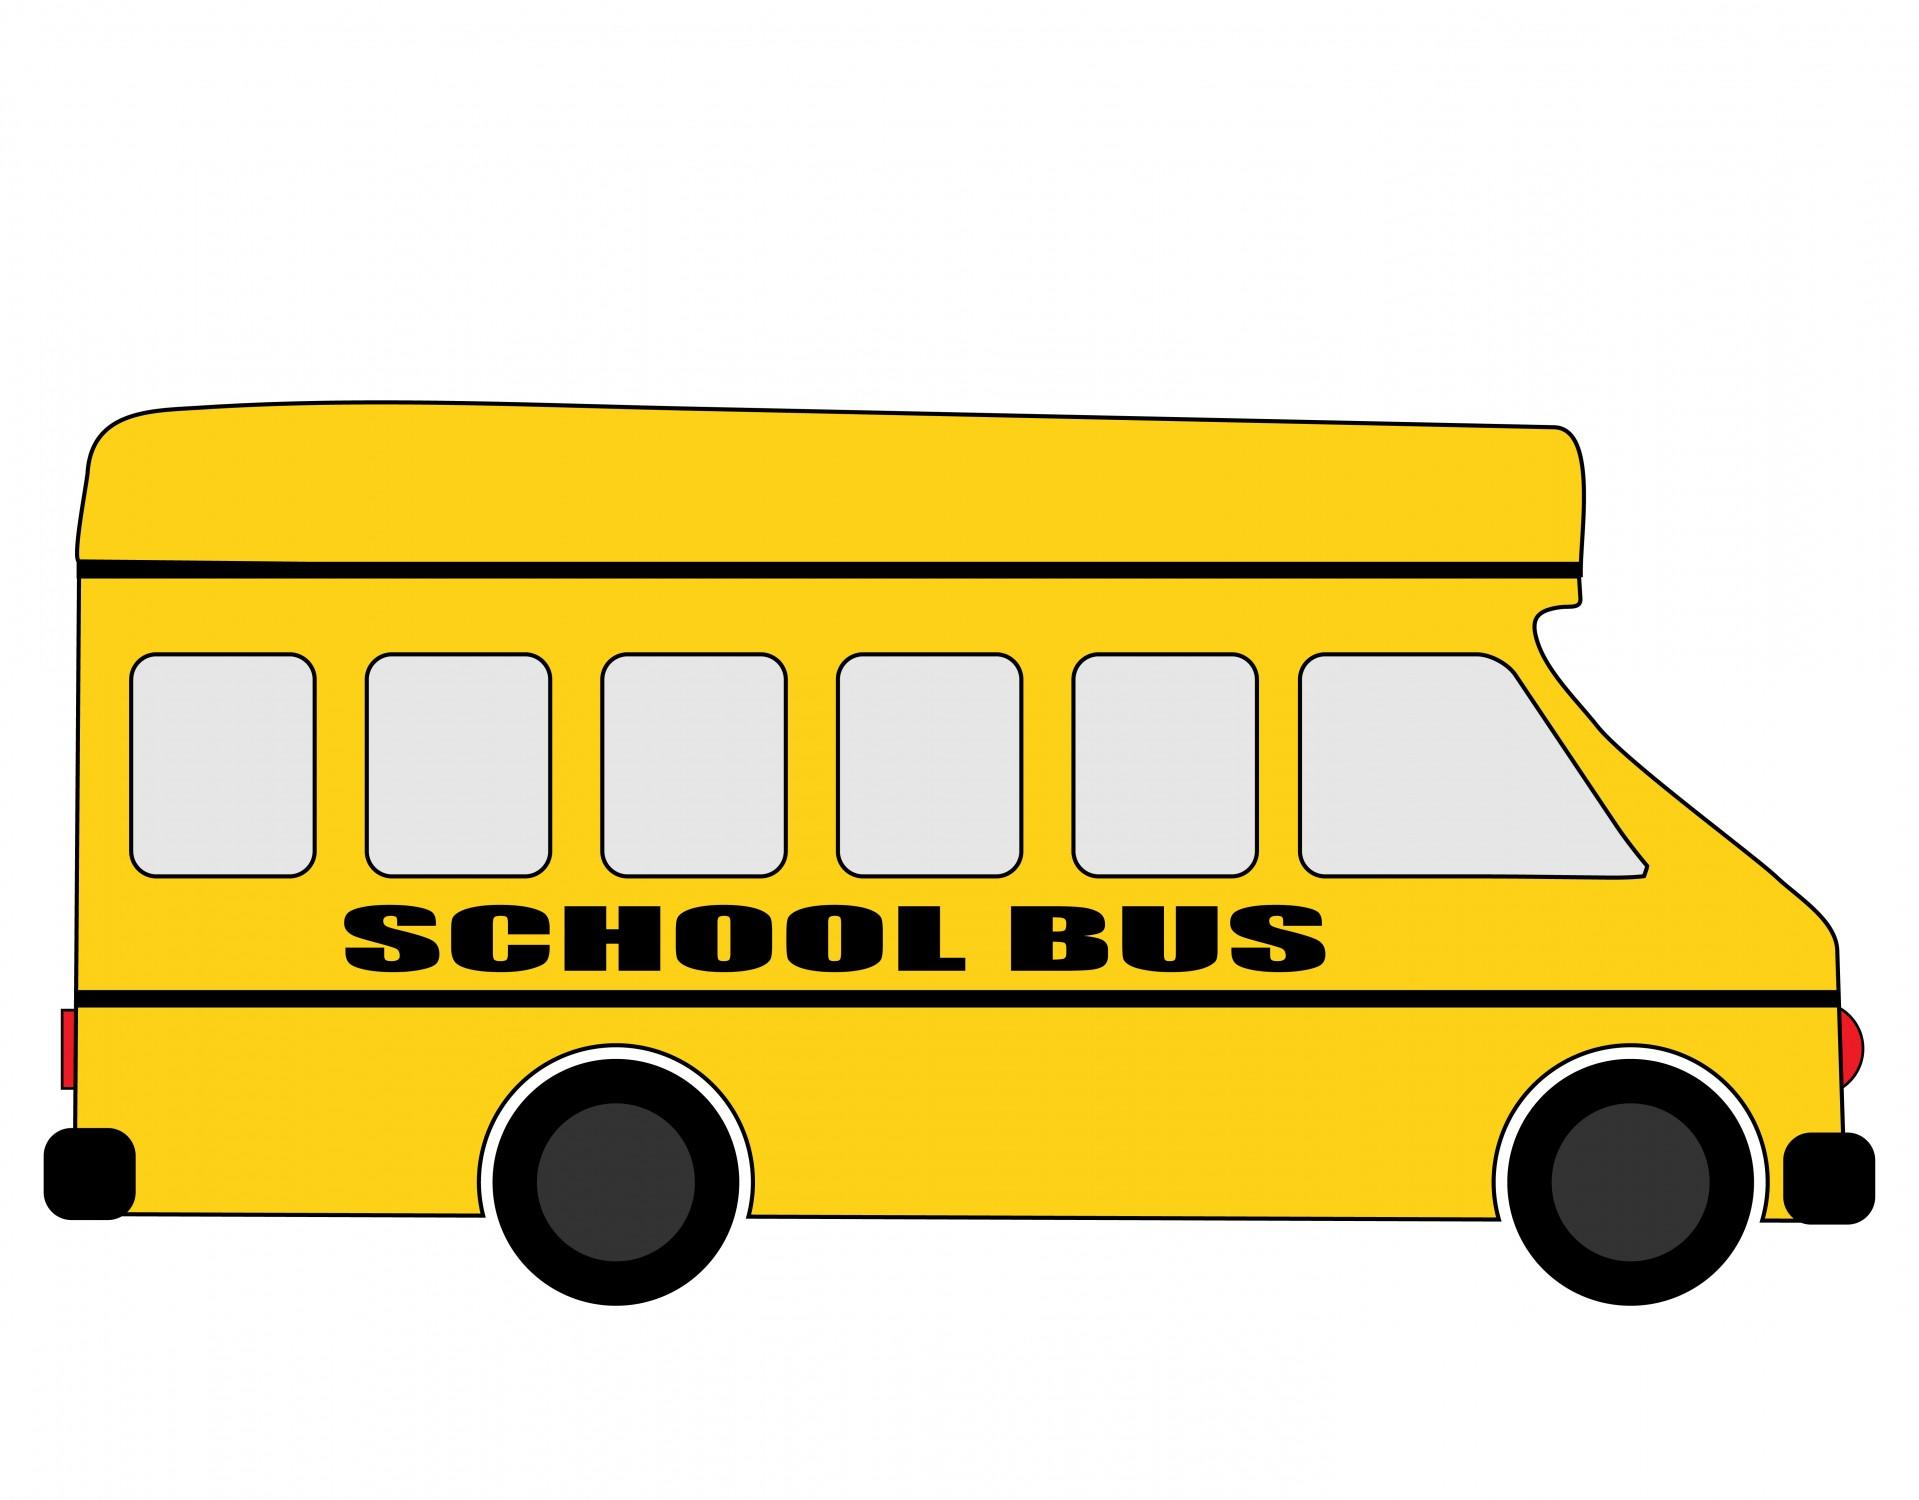 1919x1500 School Bus Clipart Free Stock Photo